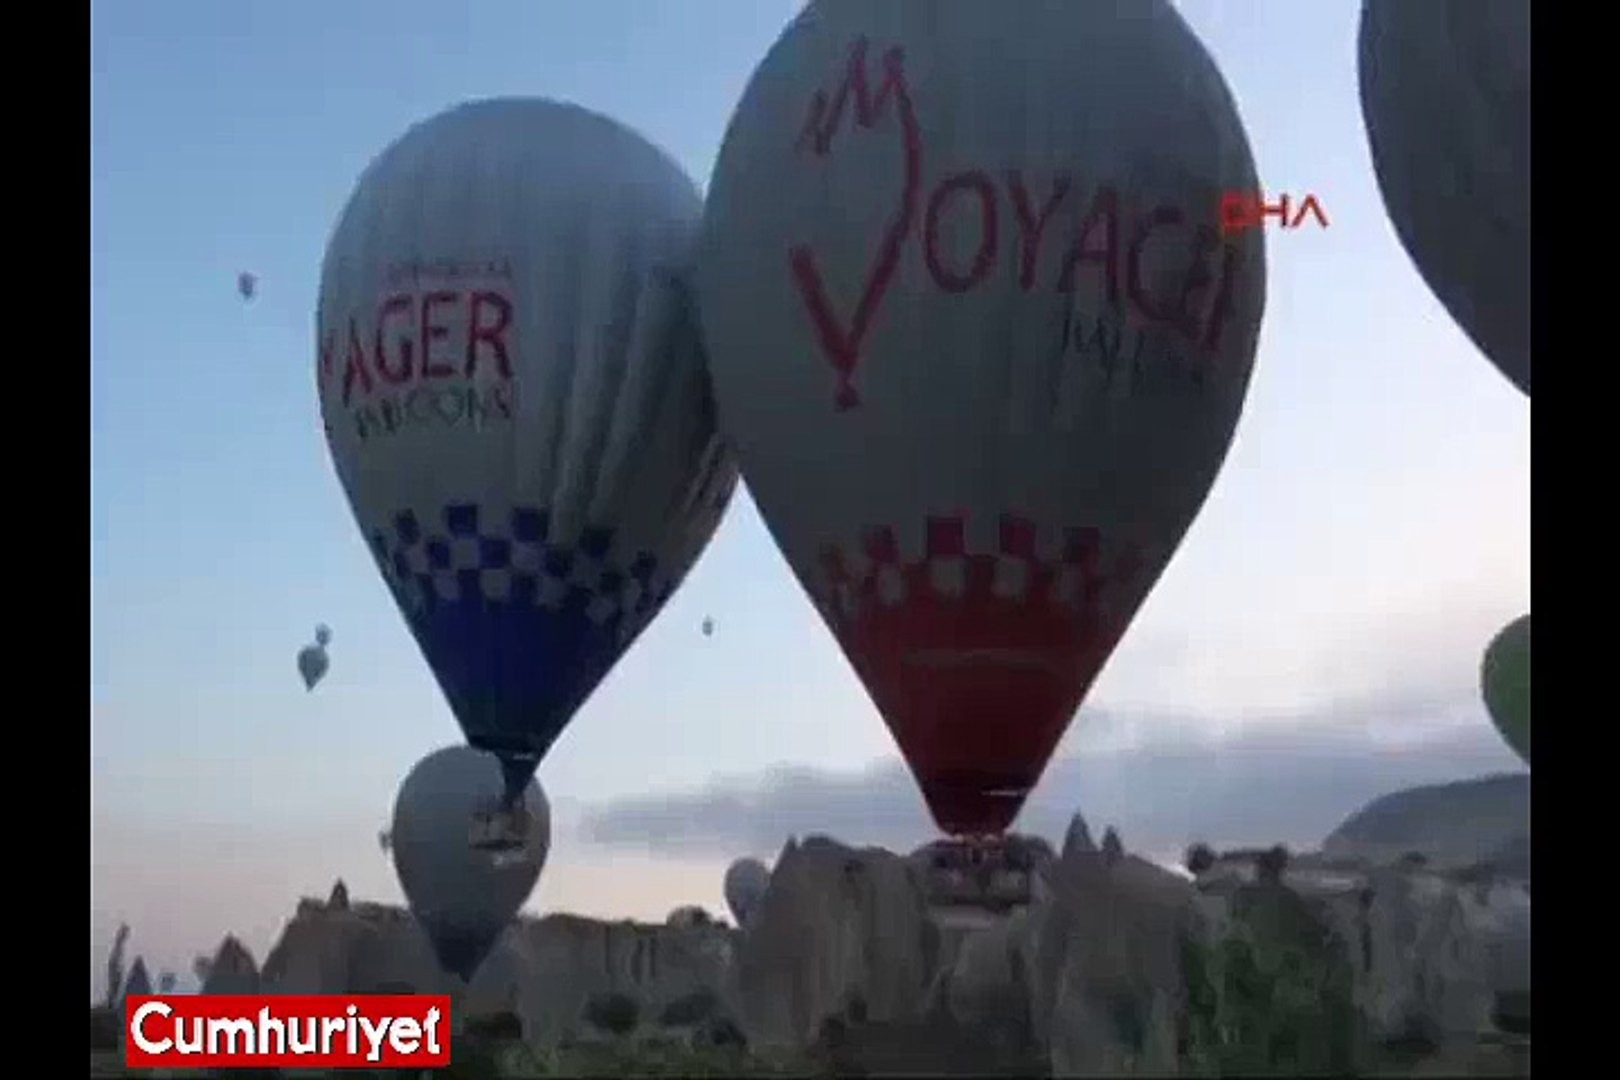 Kapadokya'da balon sert iniş yaptı: 8 turist yaralandı